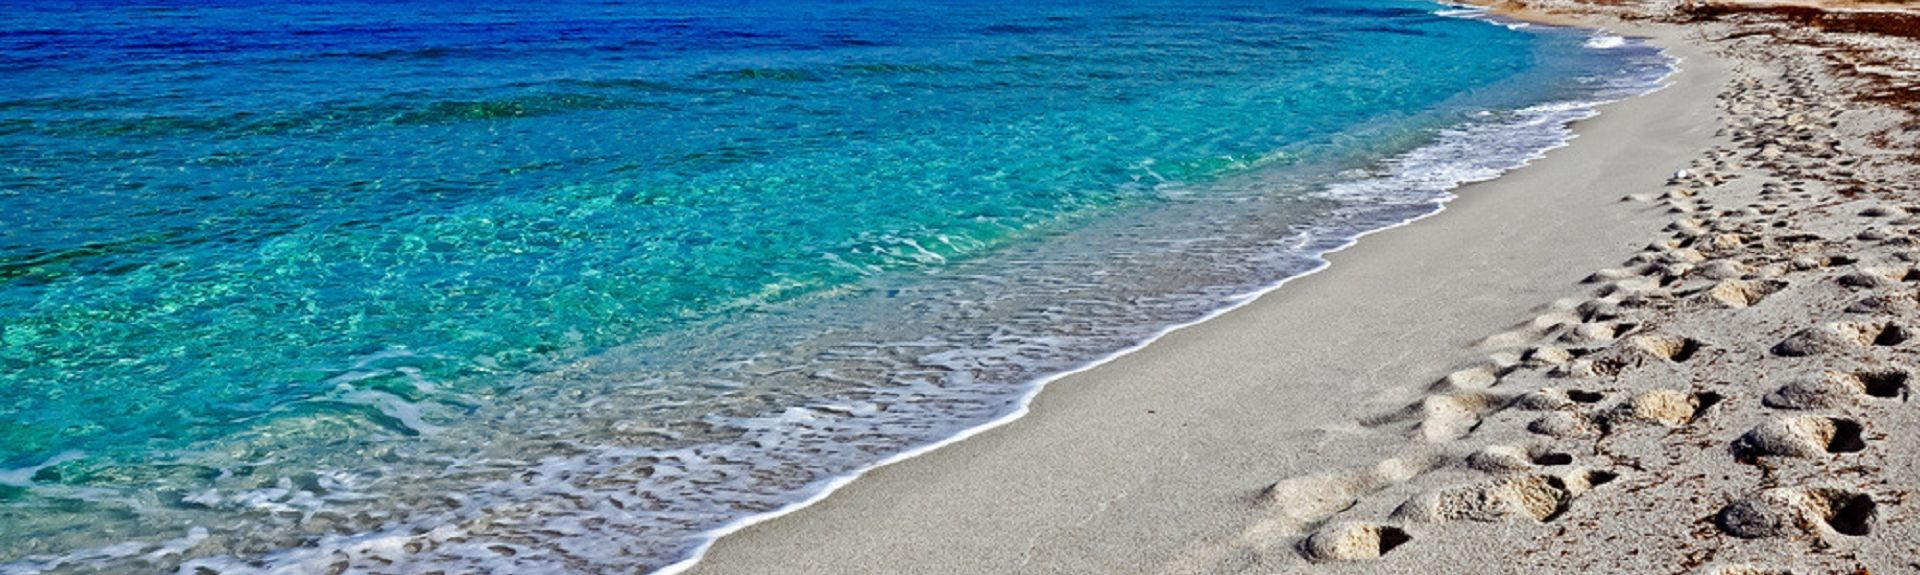 Is Arenas-stranden, Sardinia, Italia